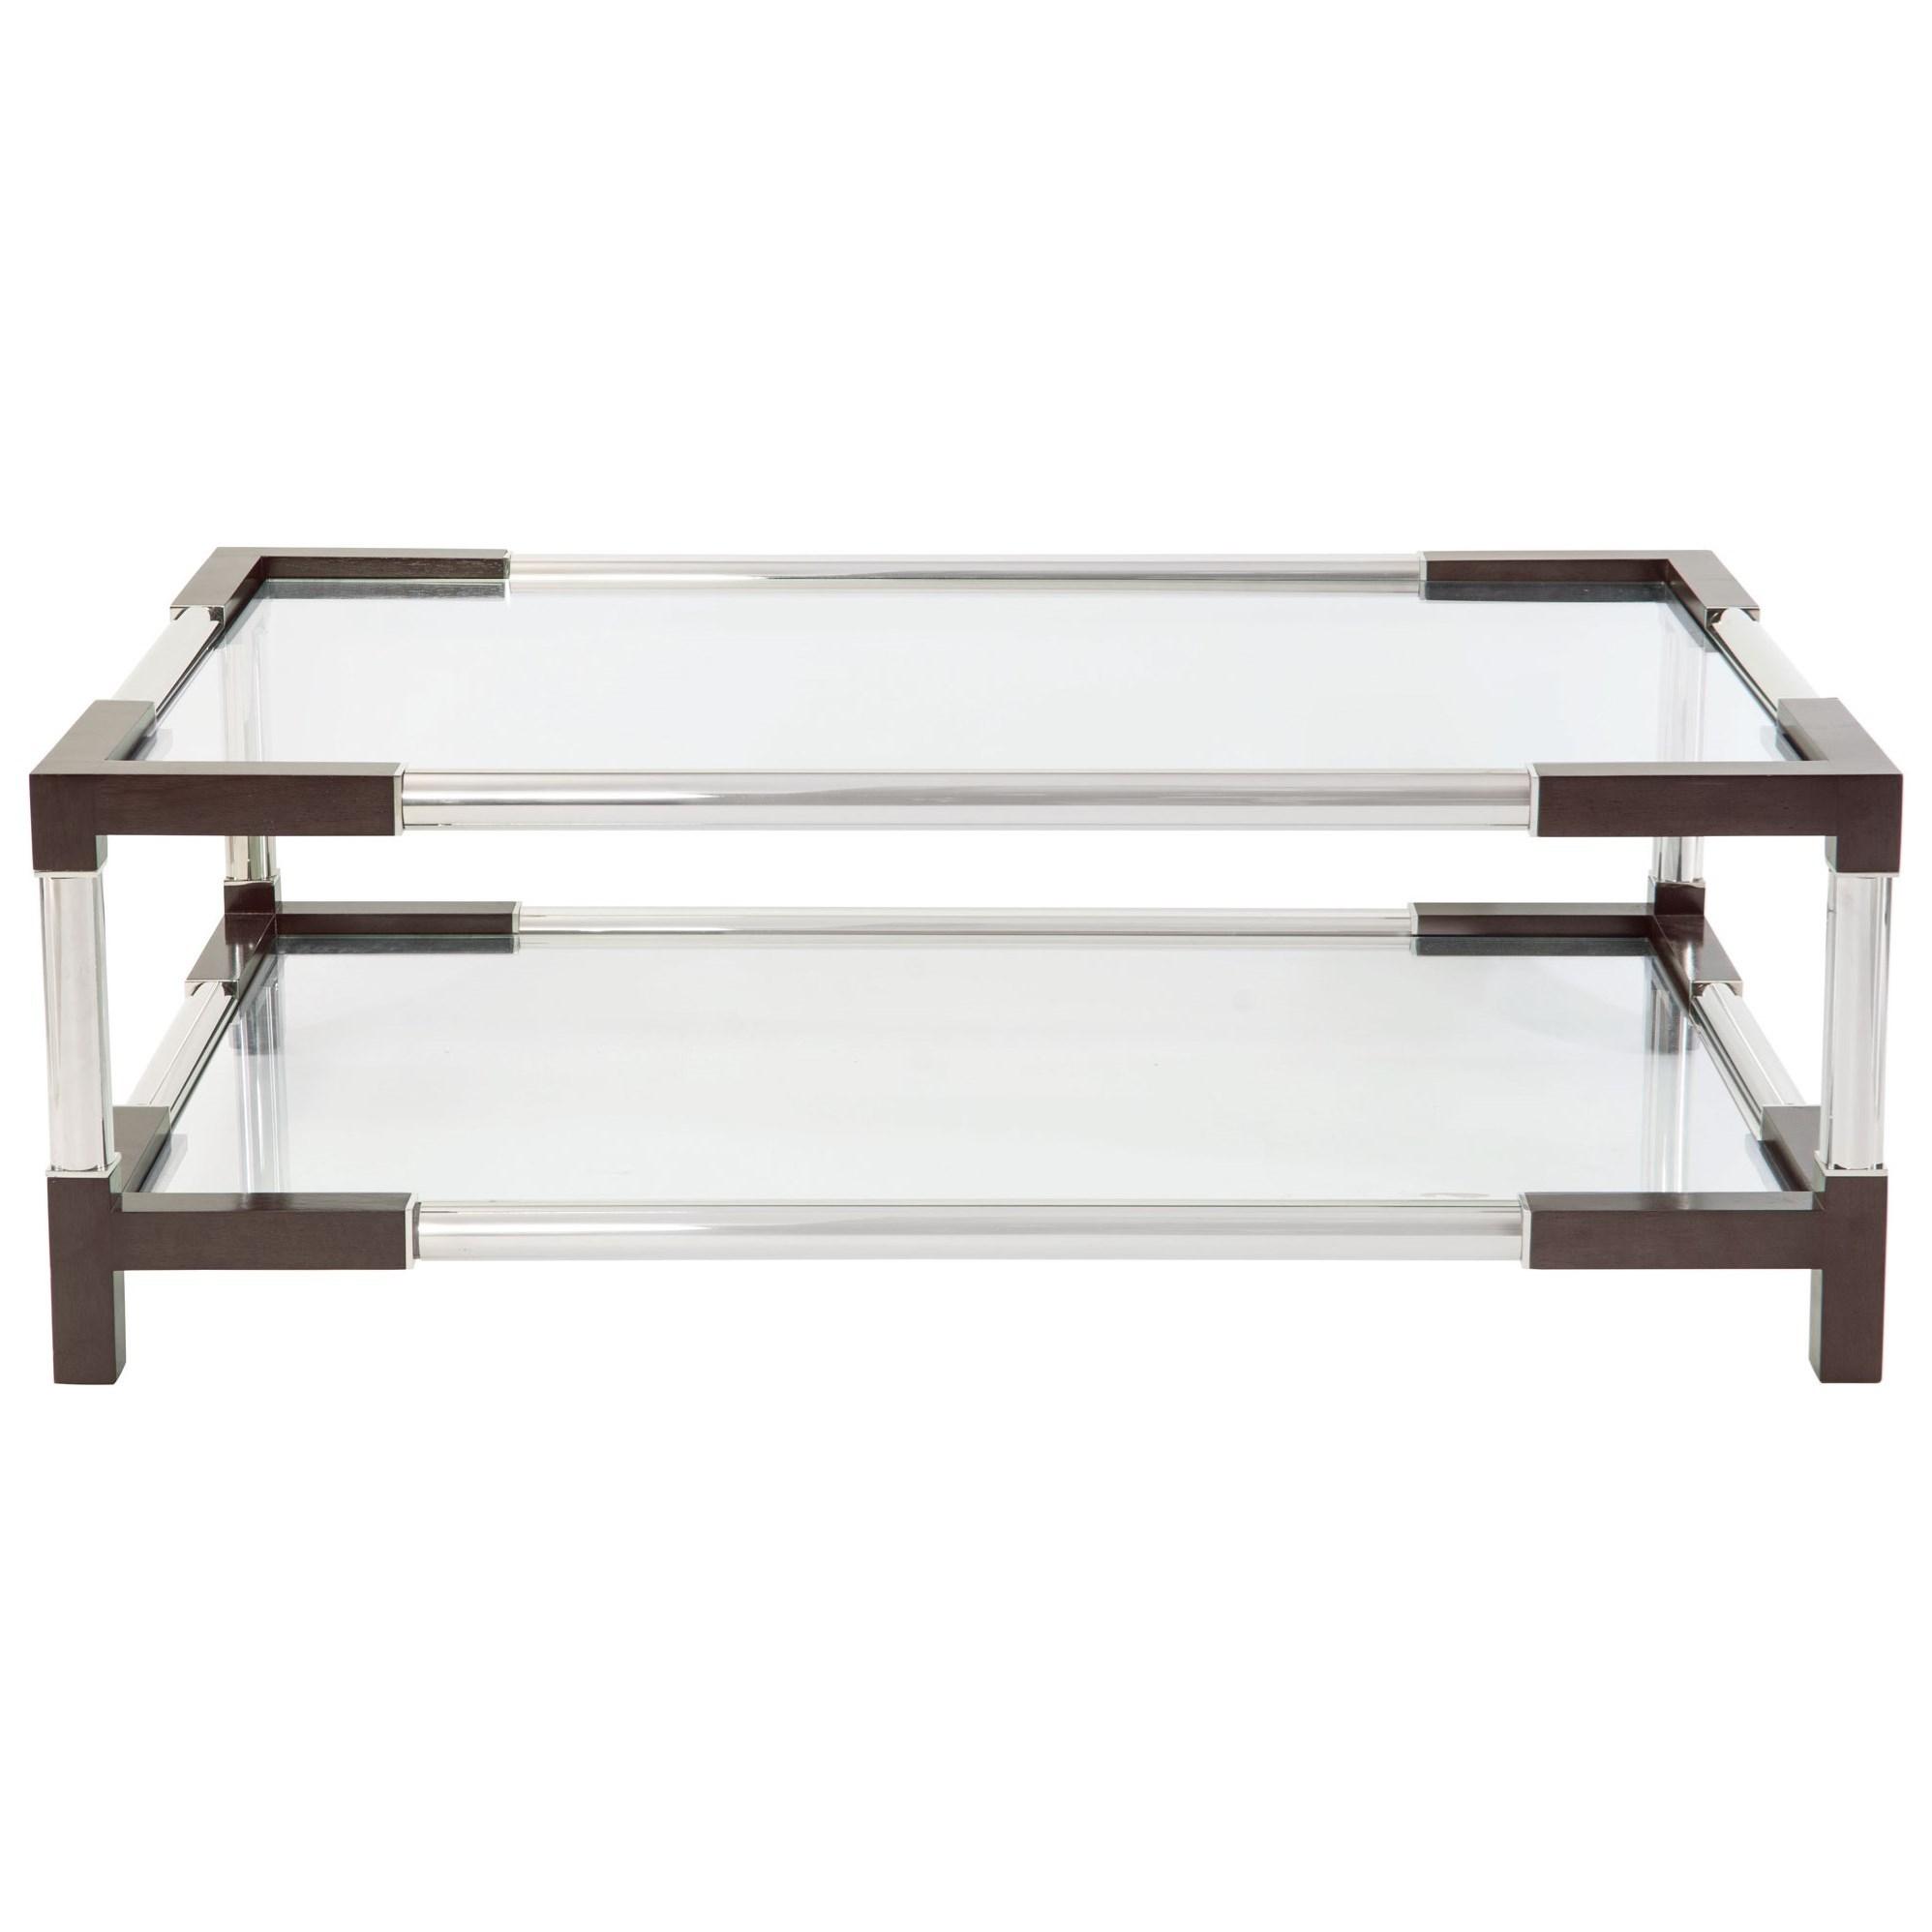 Bernhardt Interiors - Accents Mason Cocktail Table - Item Number: 366-021